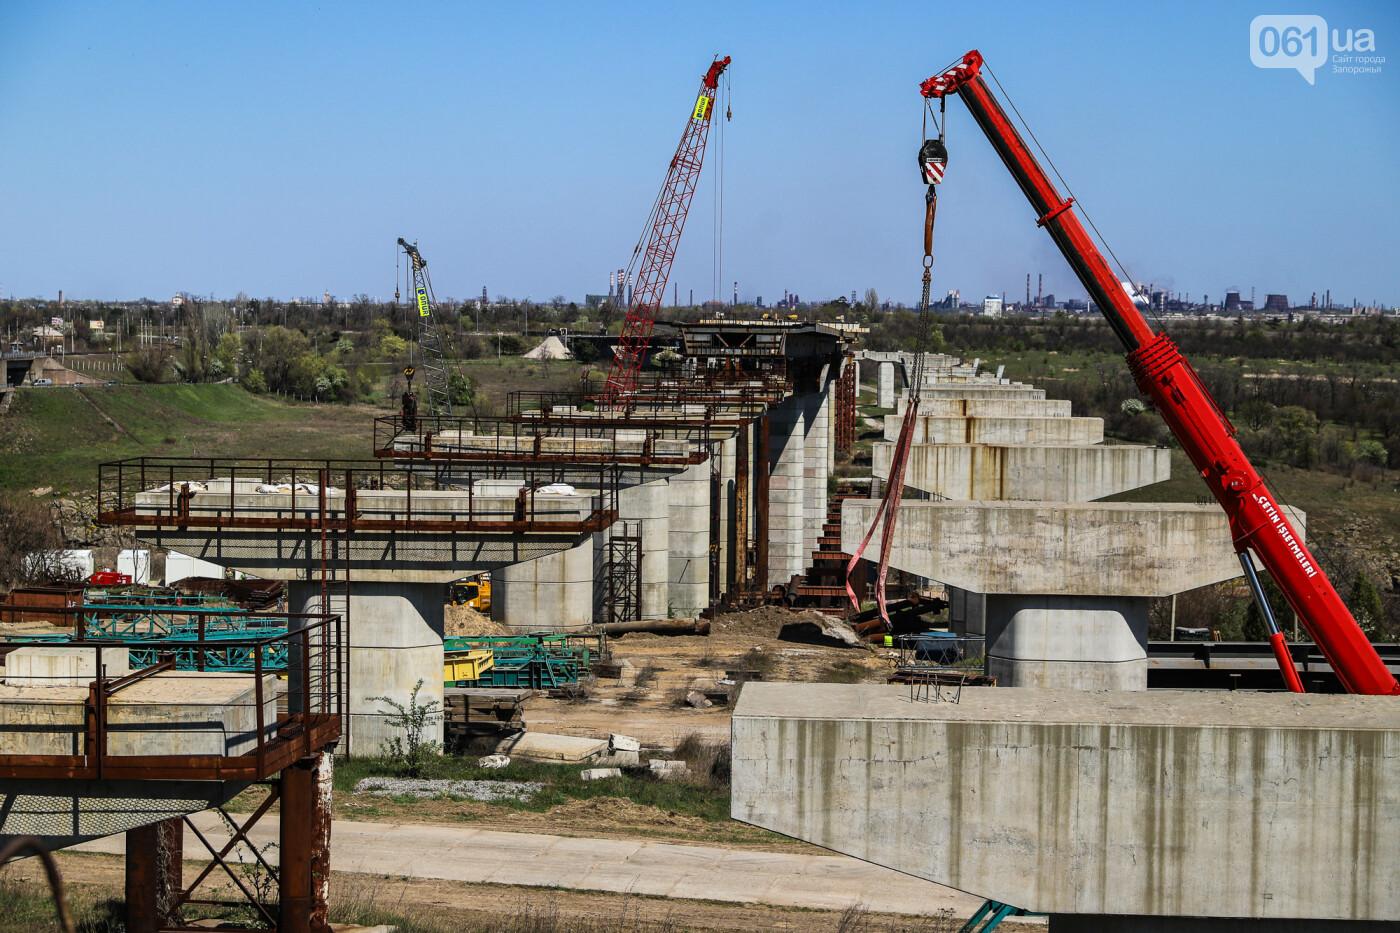 Строительство балочного моста в марте-апреле 2020